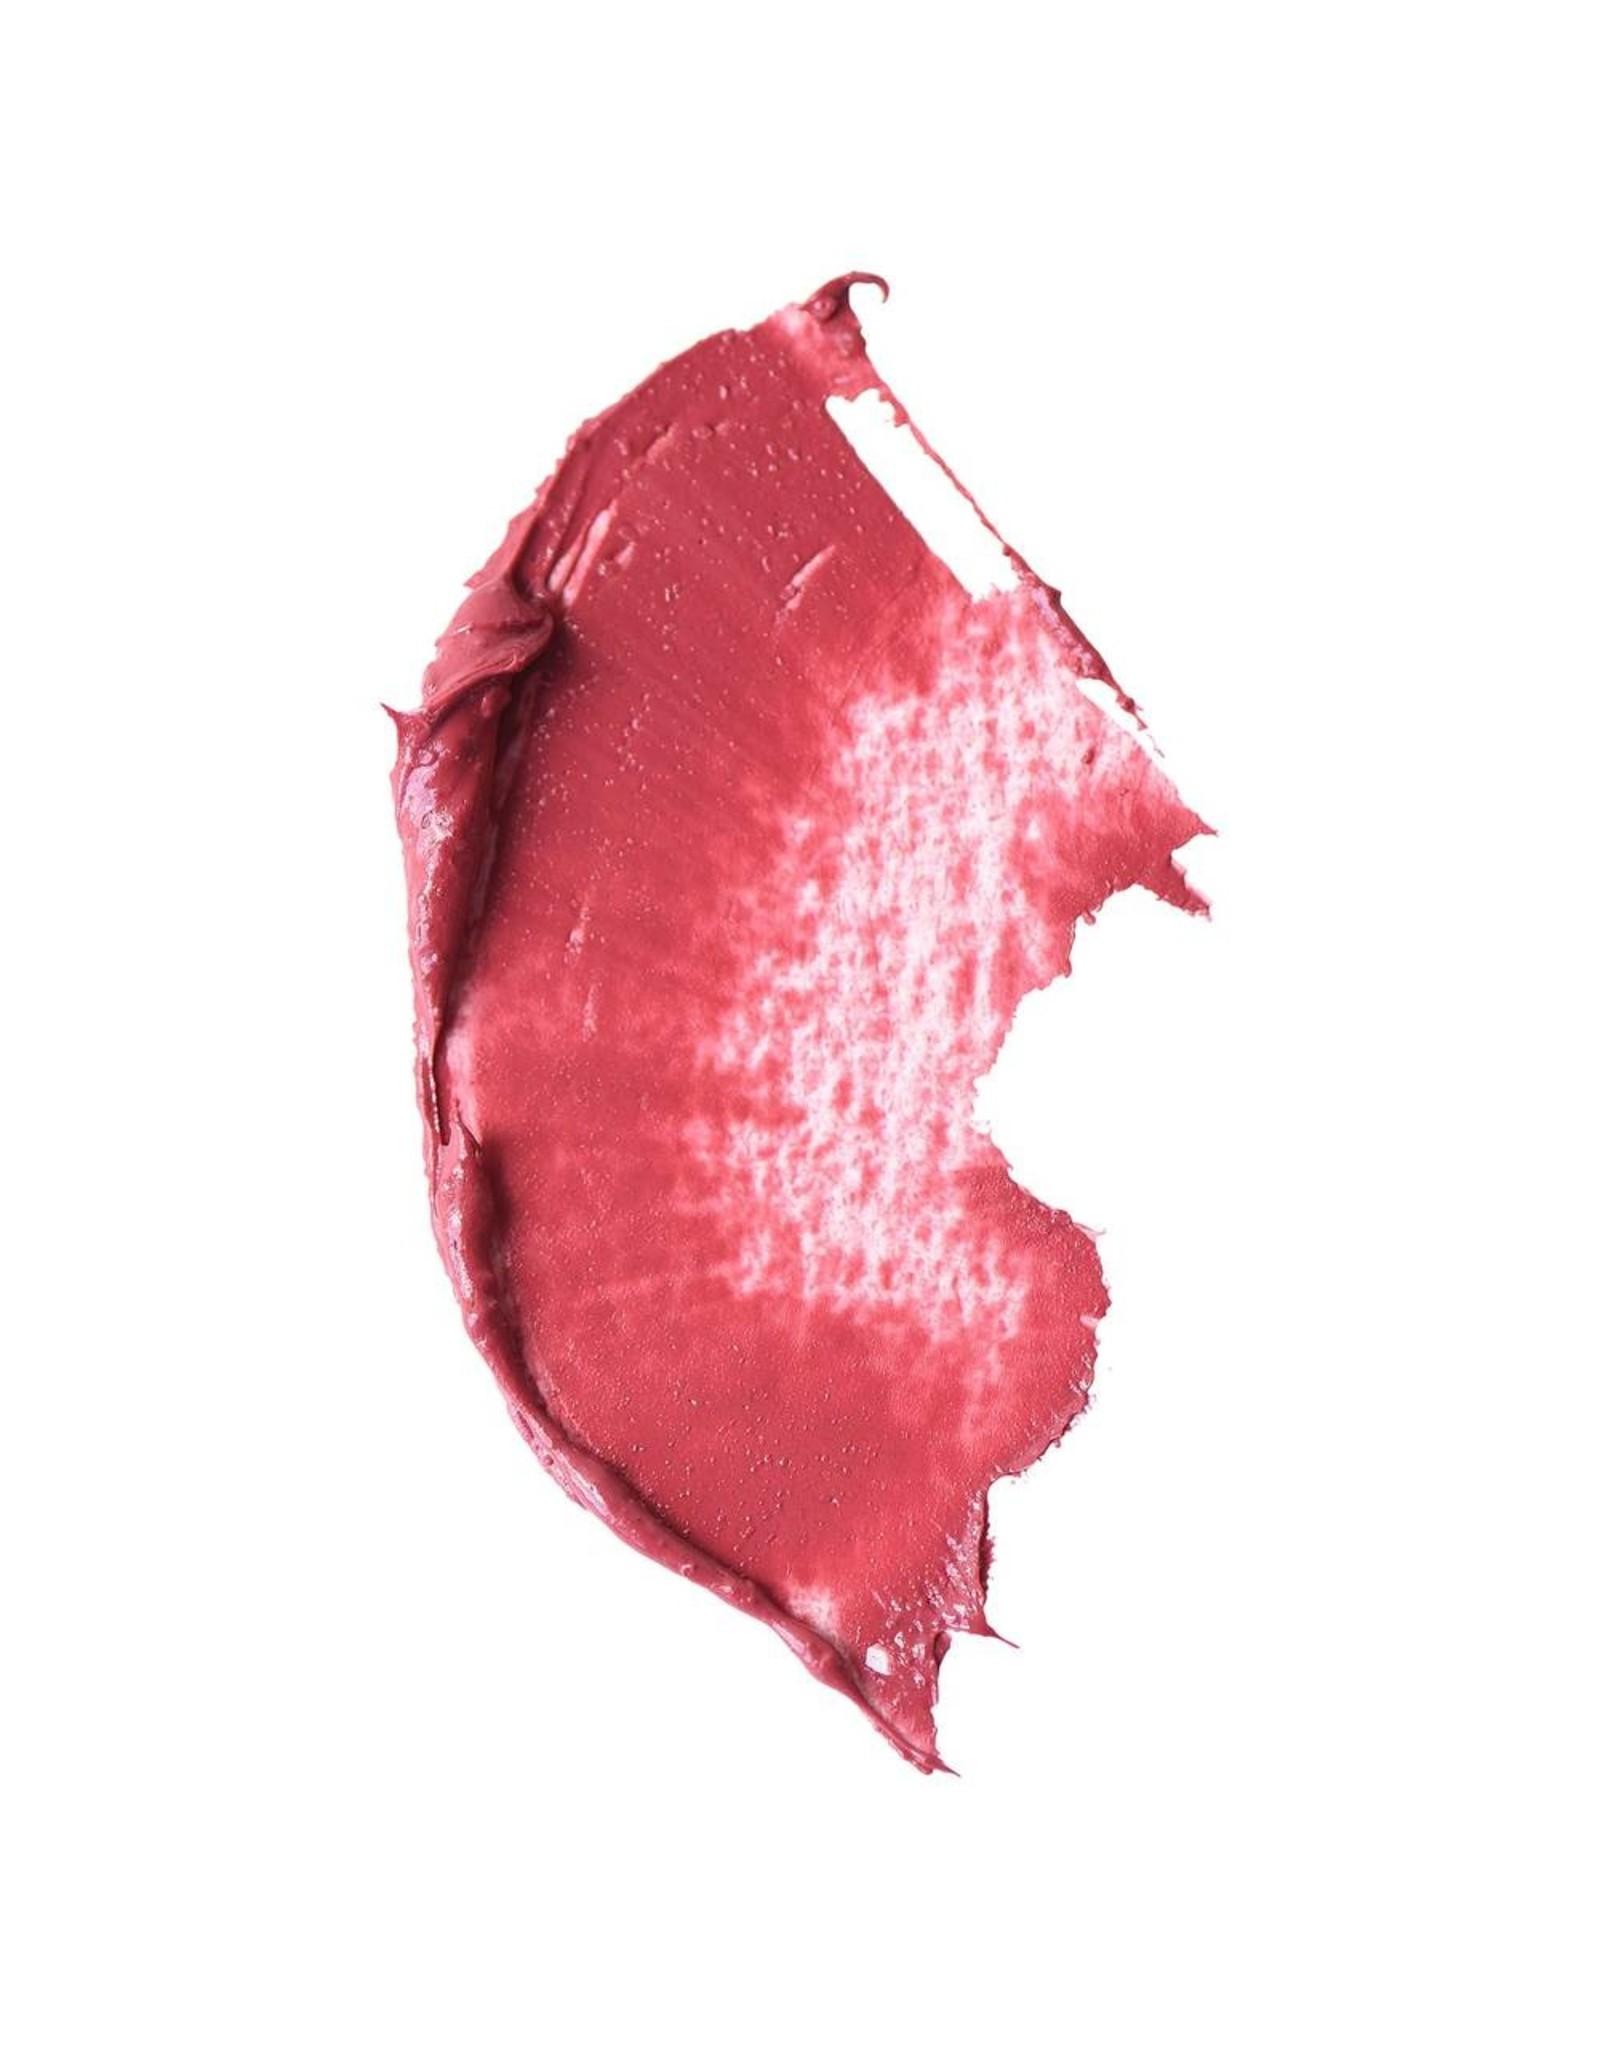 Kosas Kosas Weightless Lip Color (Stardust)